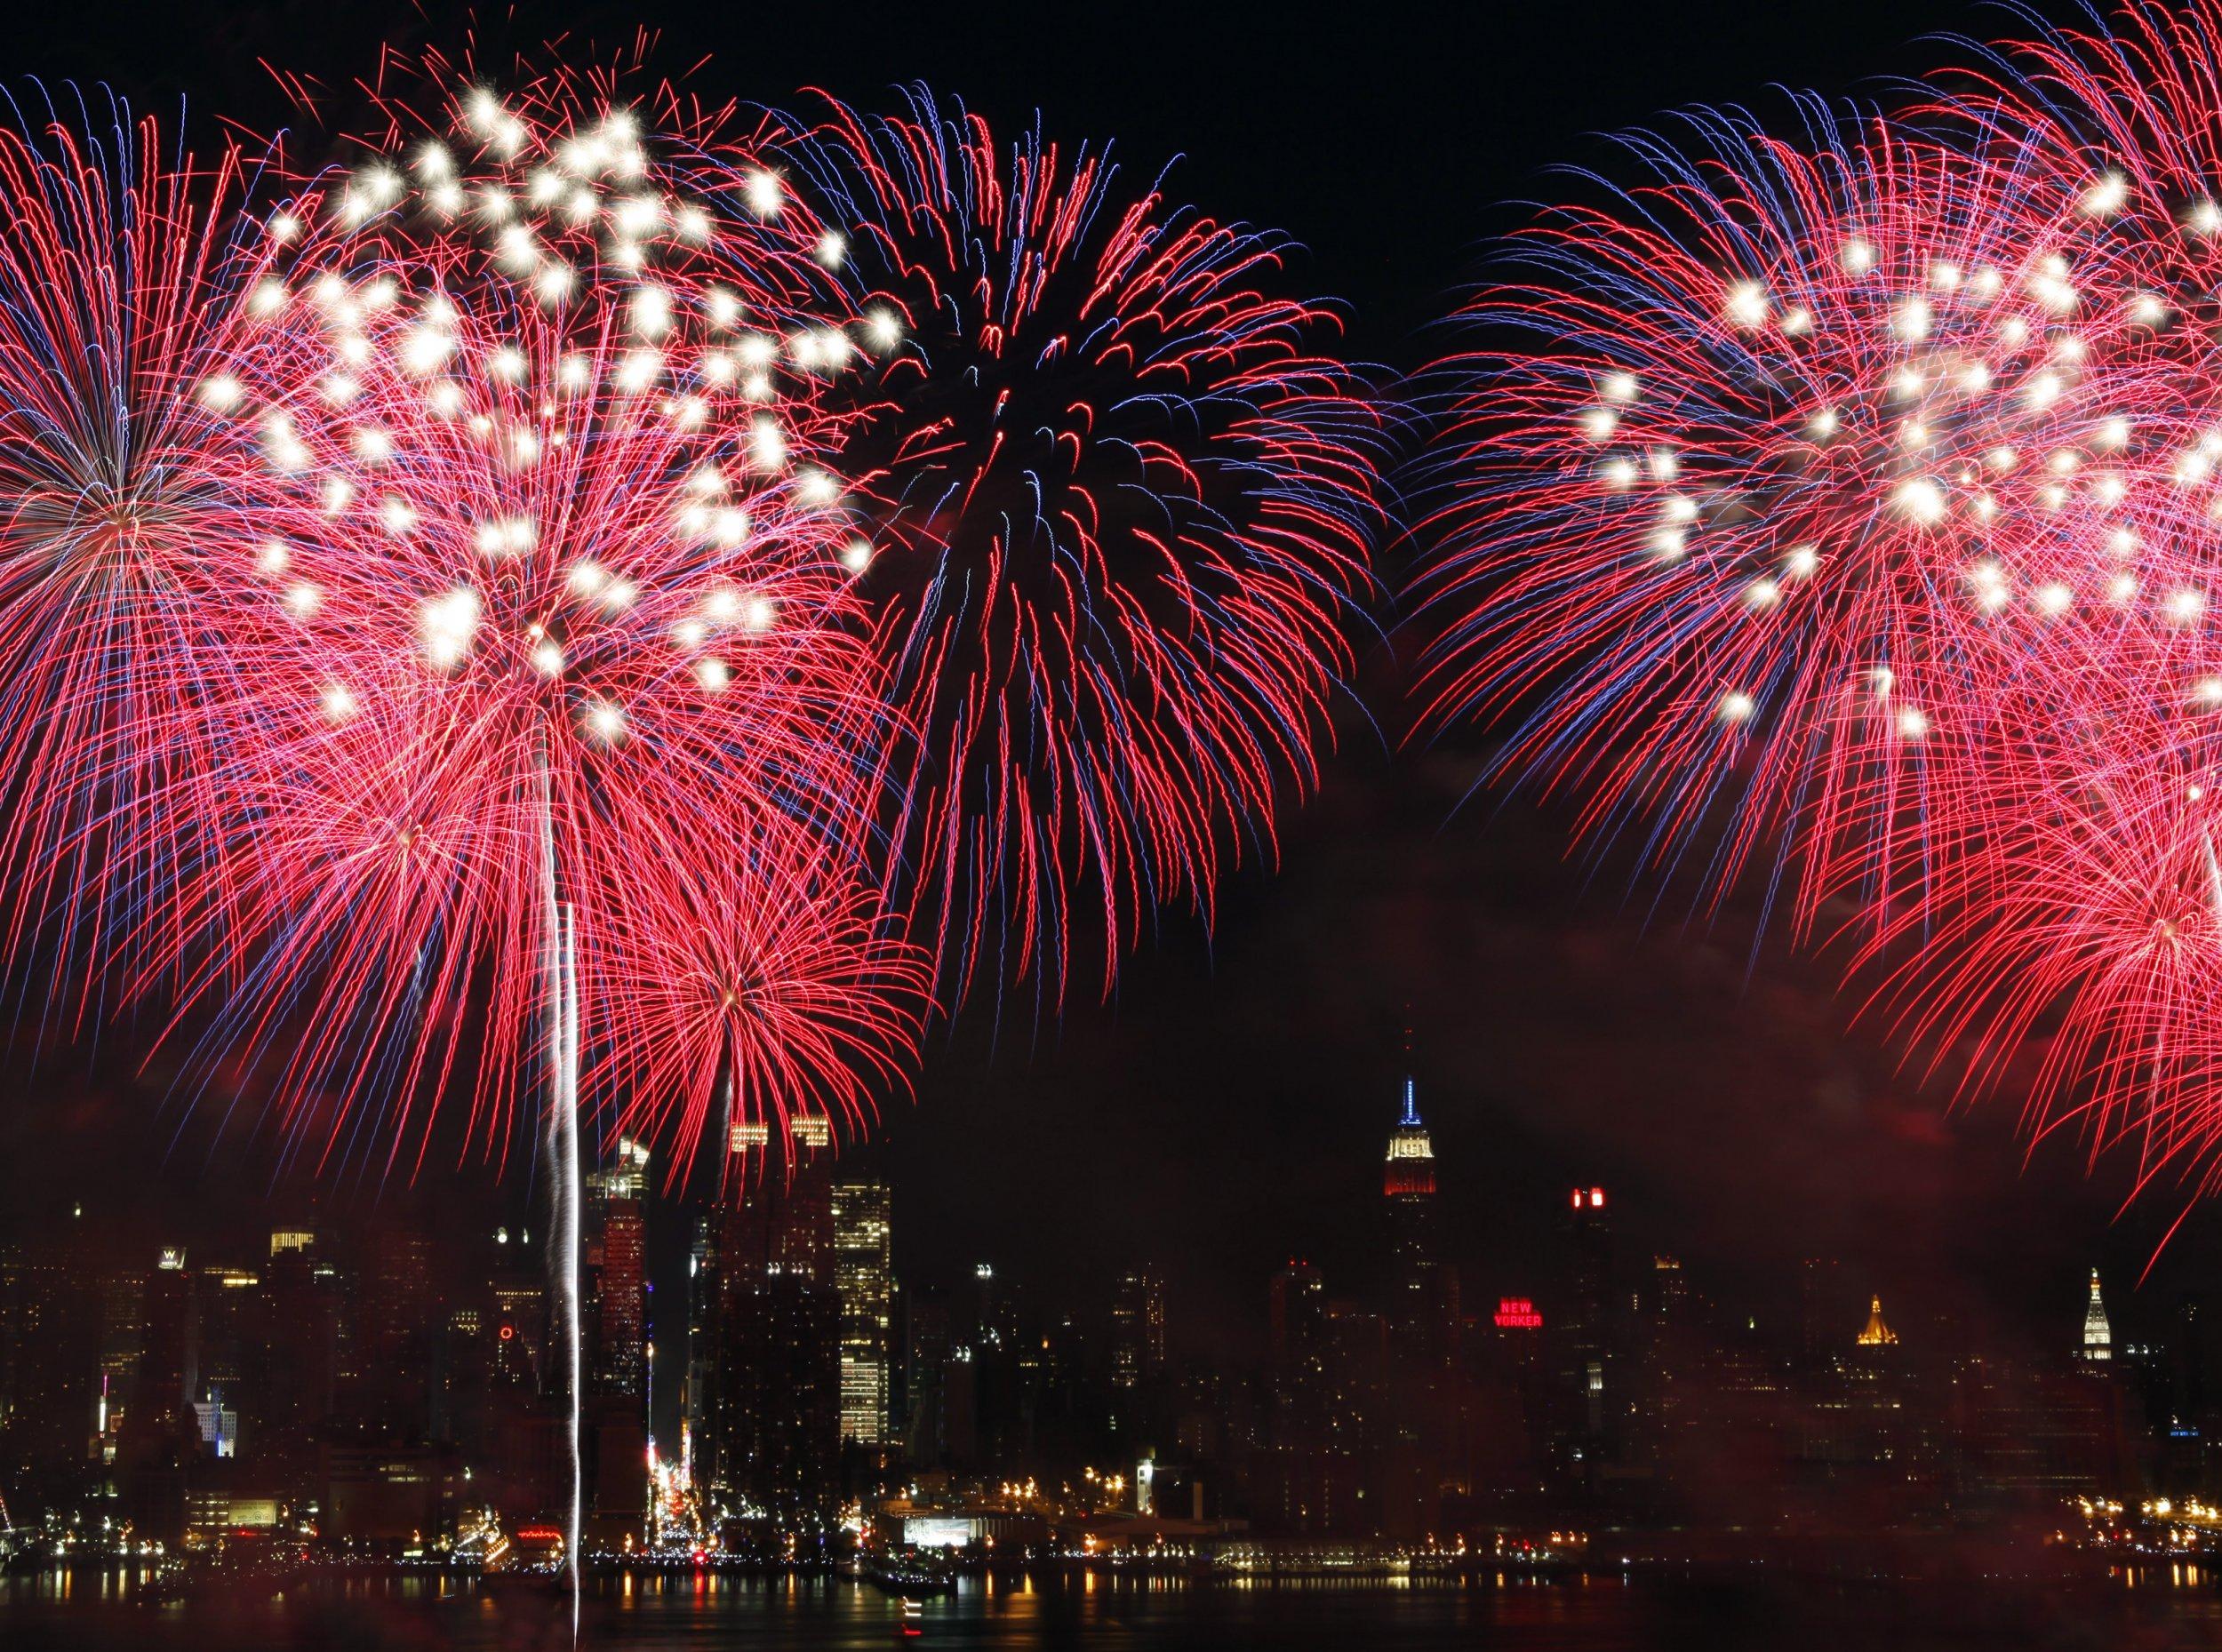 7-2-15 Fireworks